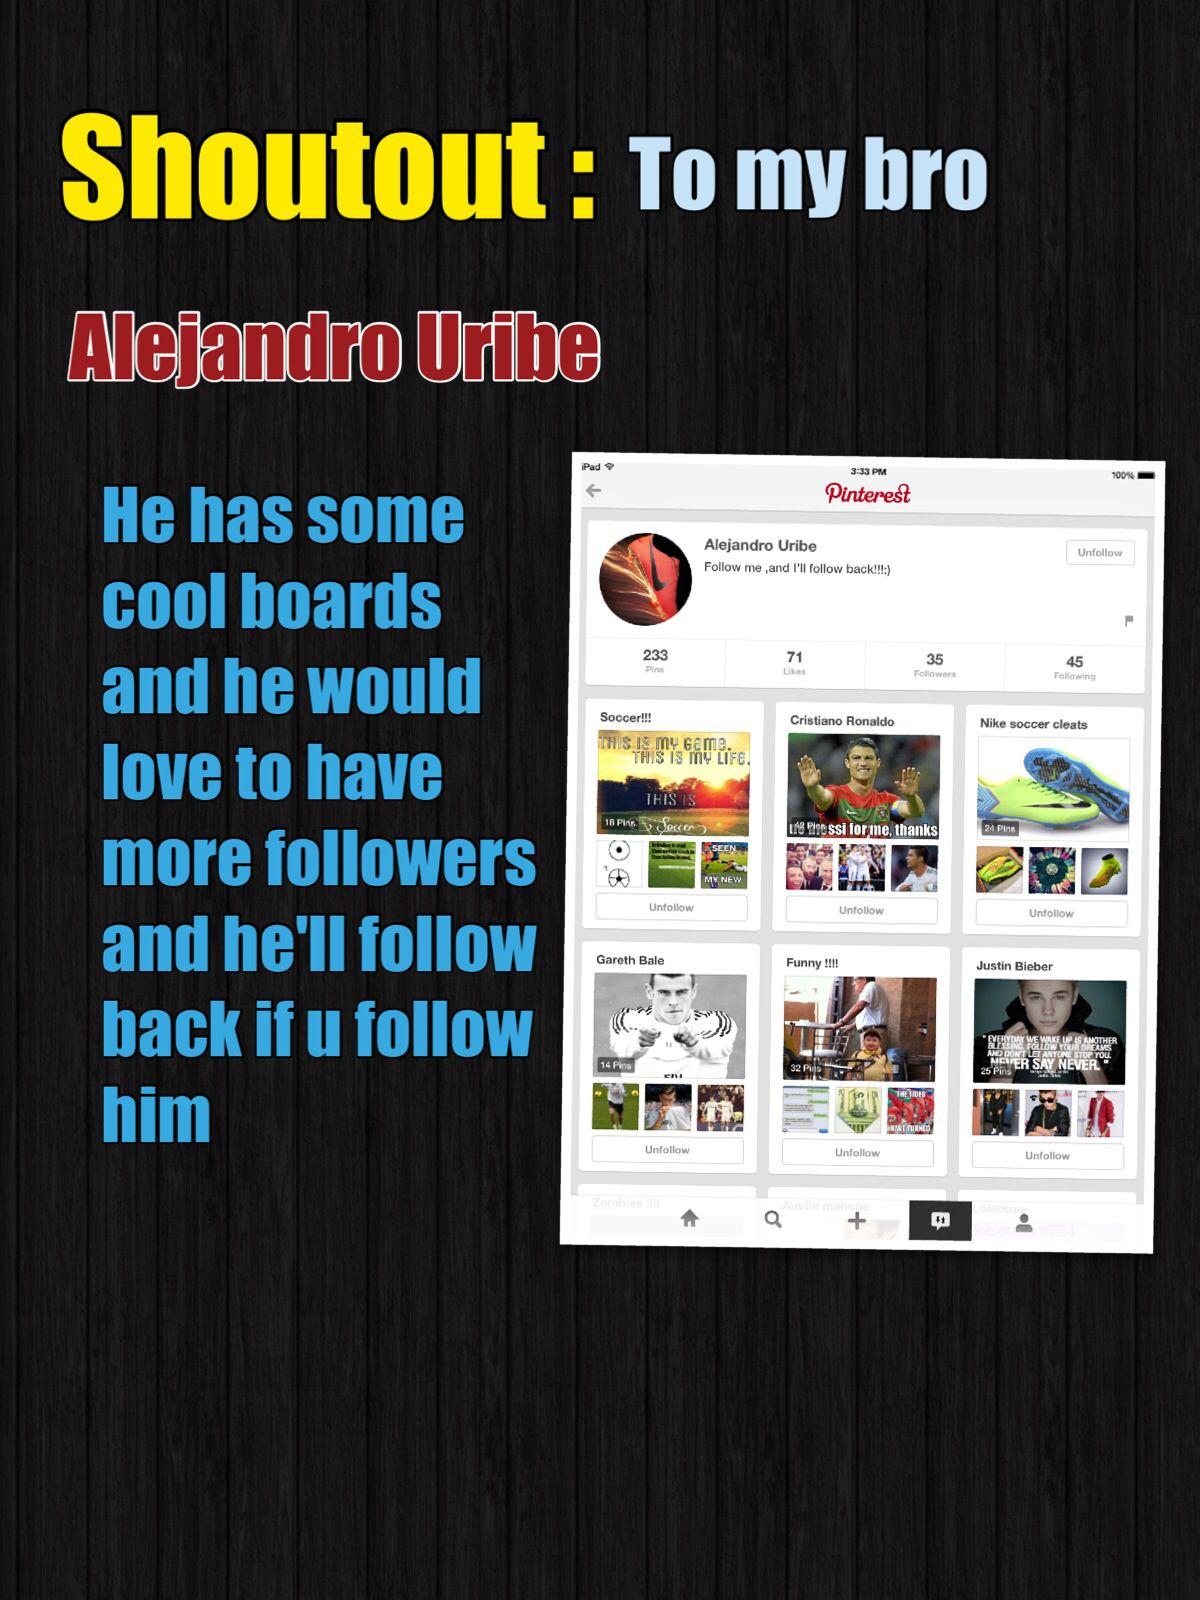 Plz follow him